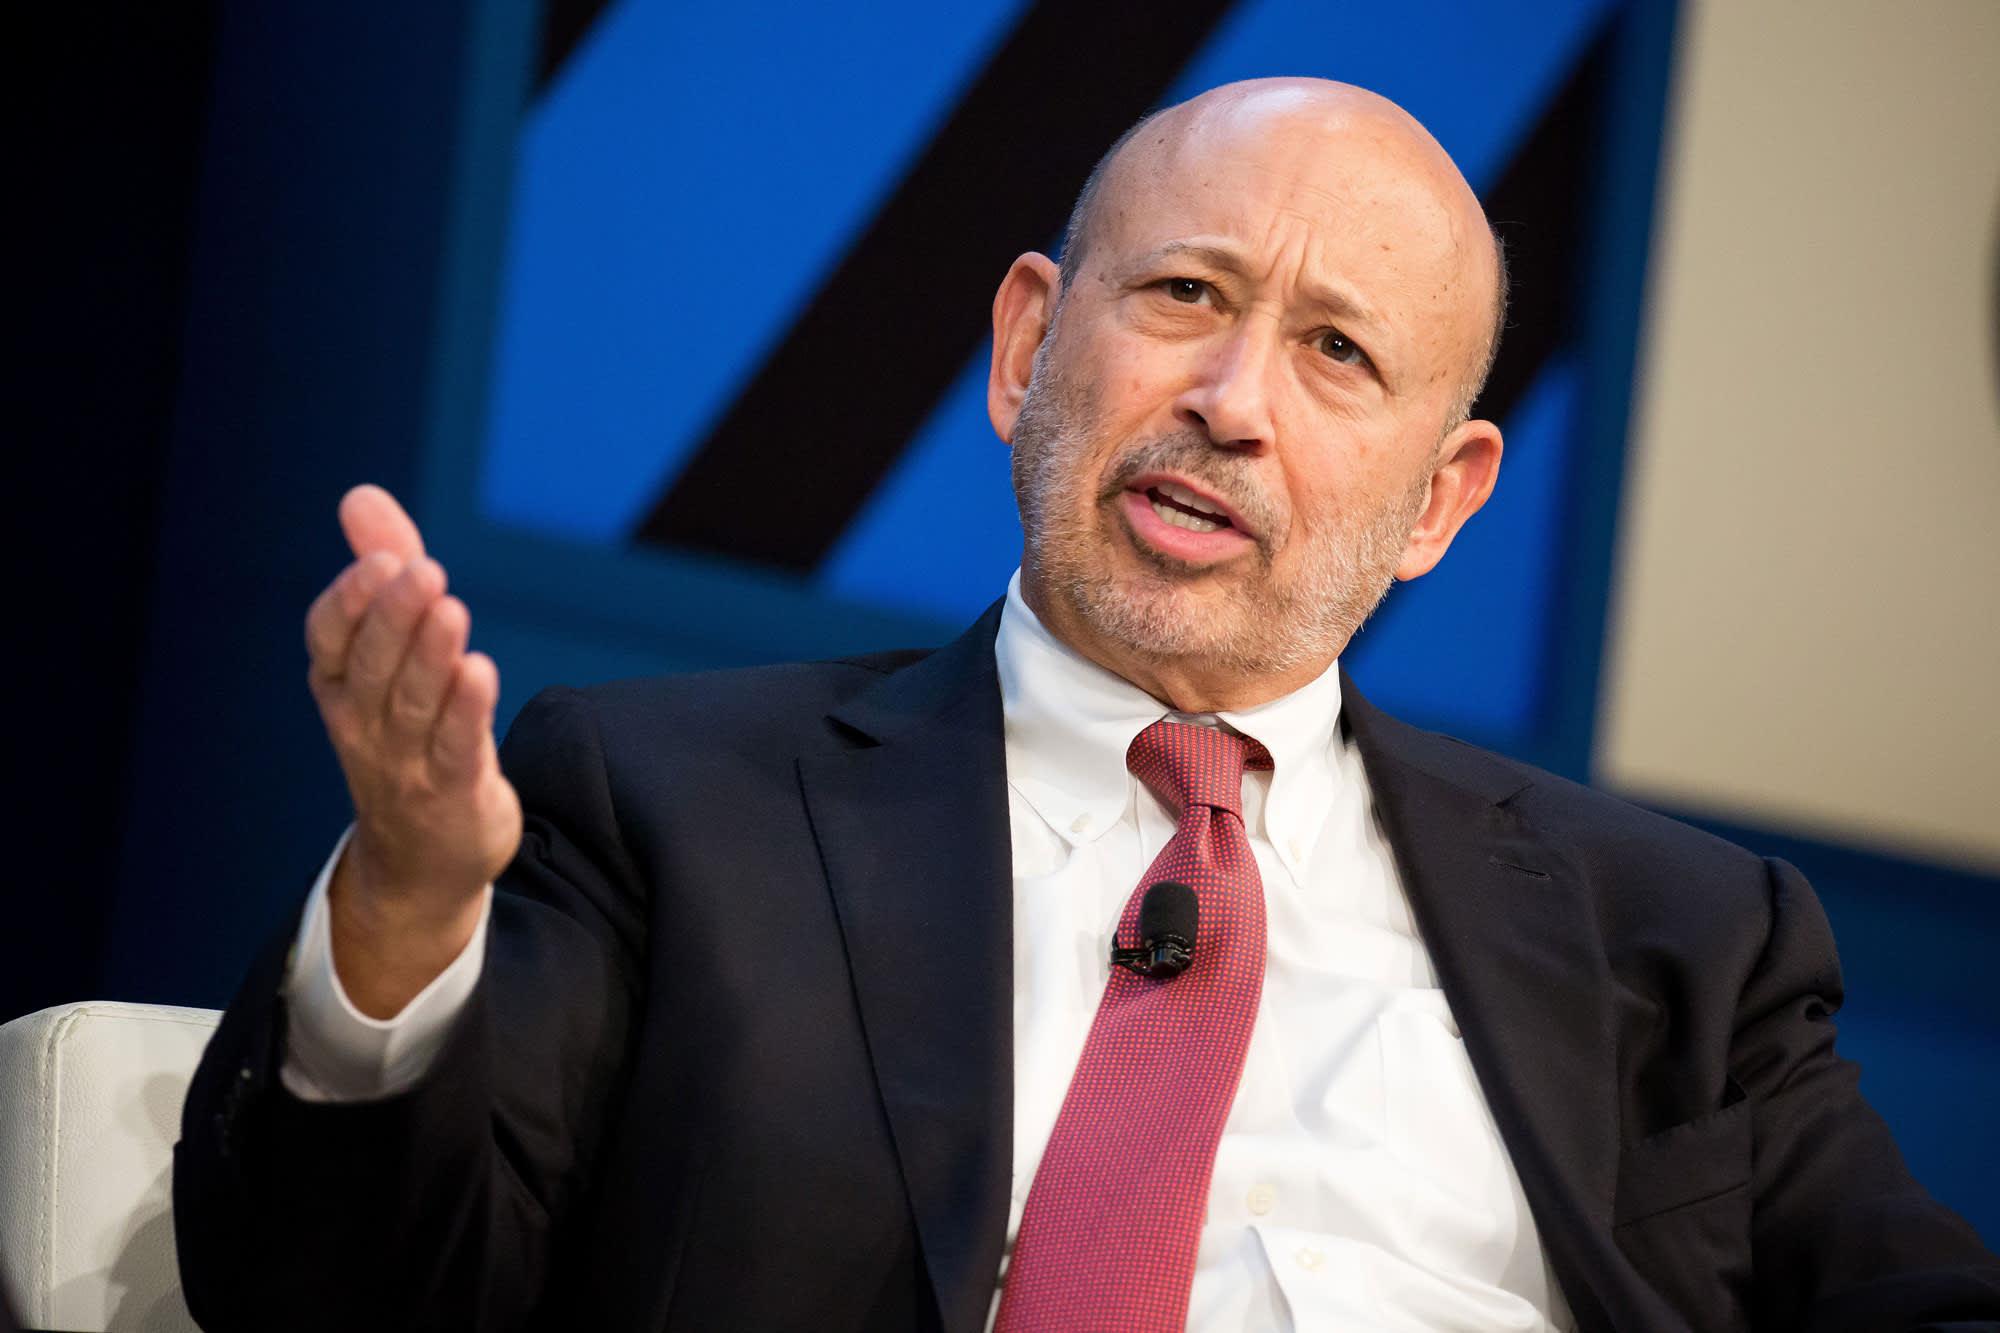 Former Goldman CEO Lloyd Blankfein on Trump's tariffs: 'I don't think he's wrong here'